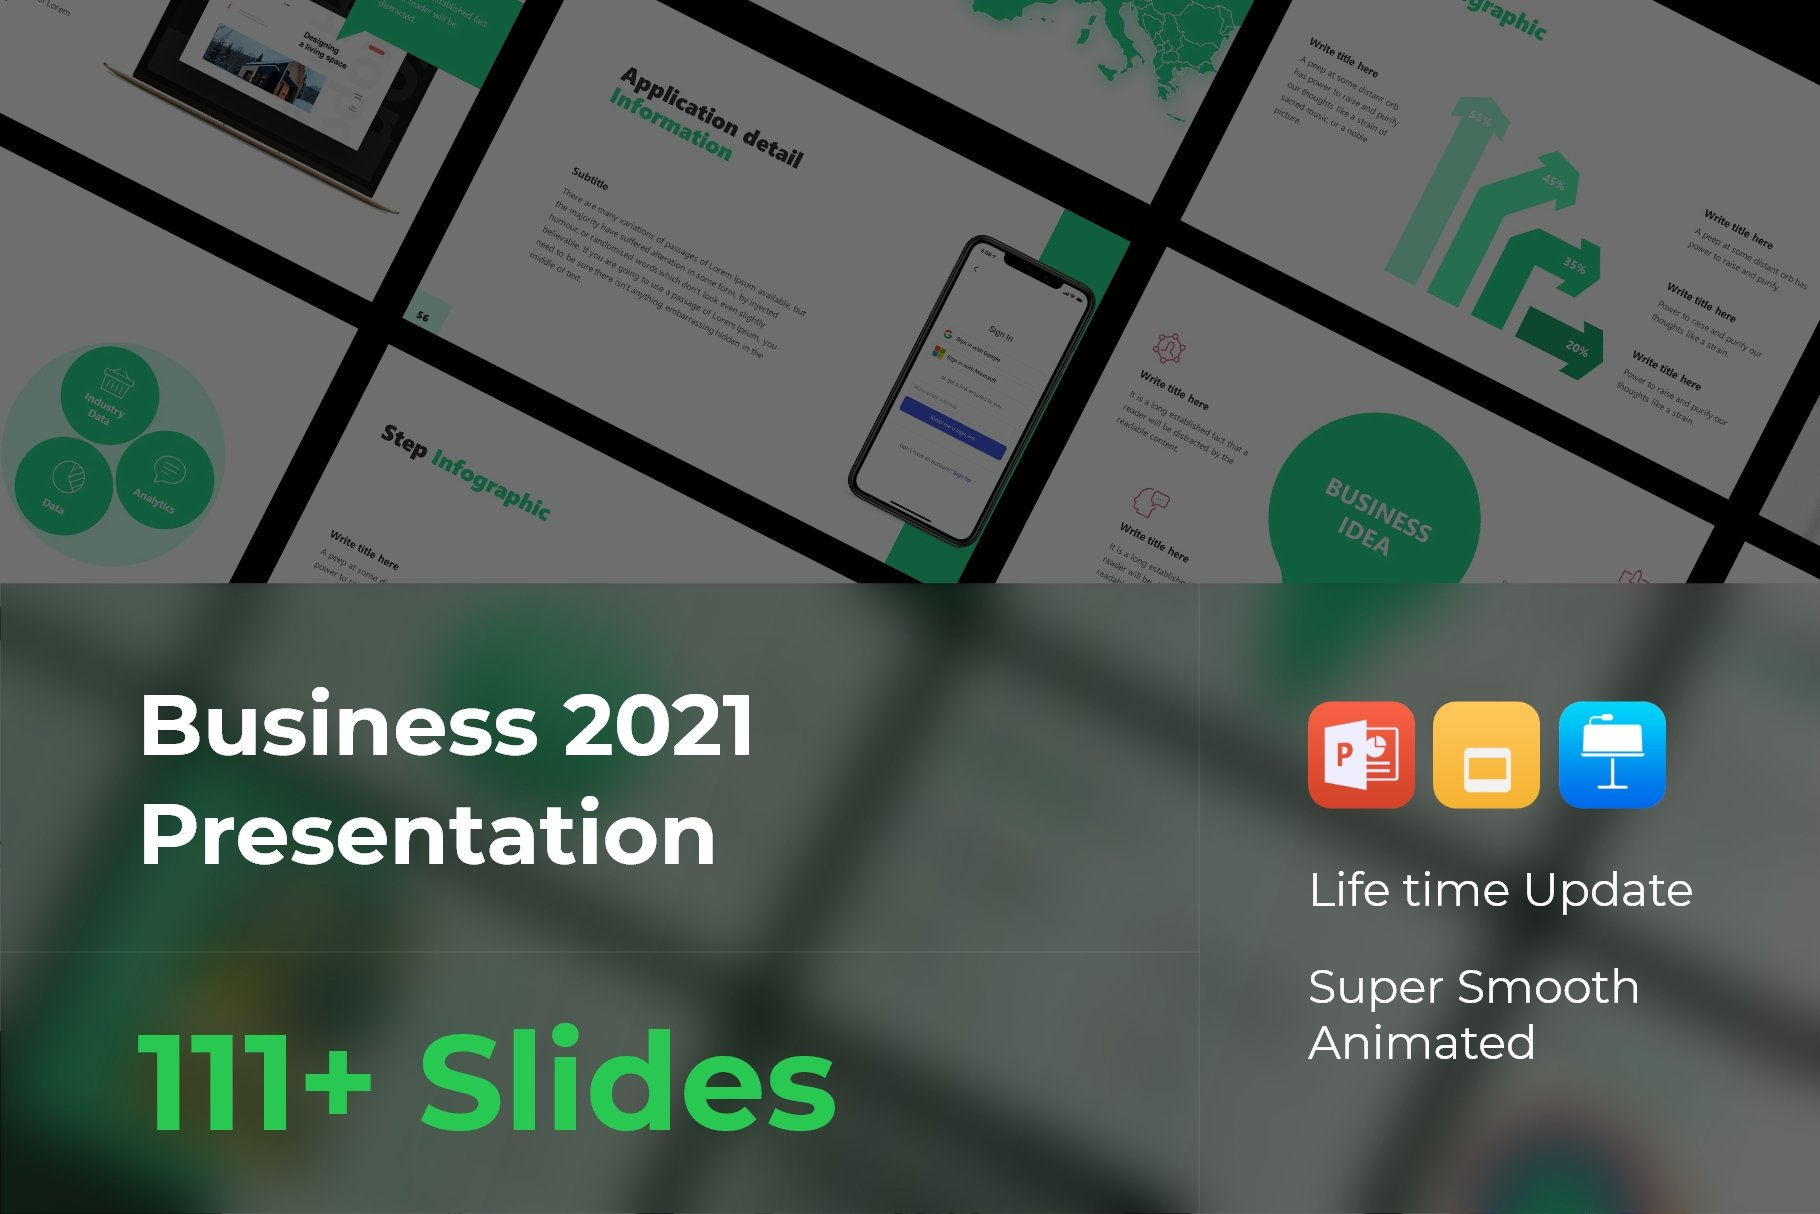 Business 2021 Animated Presentation.